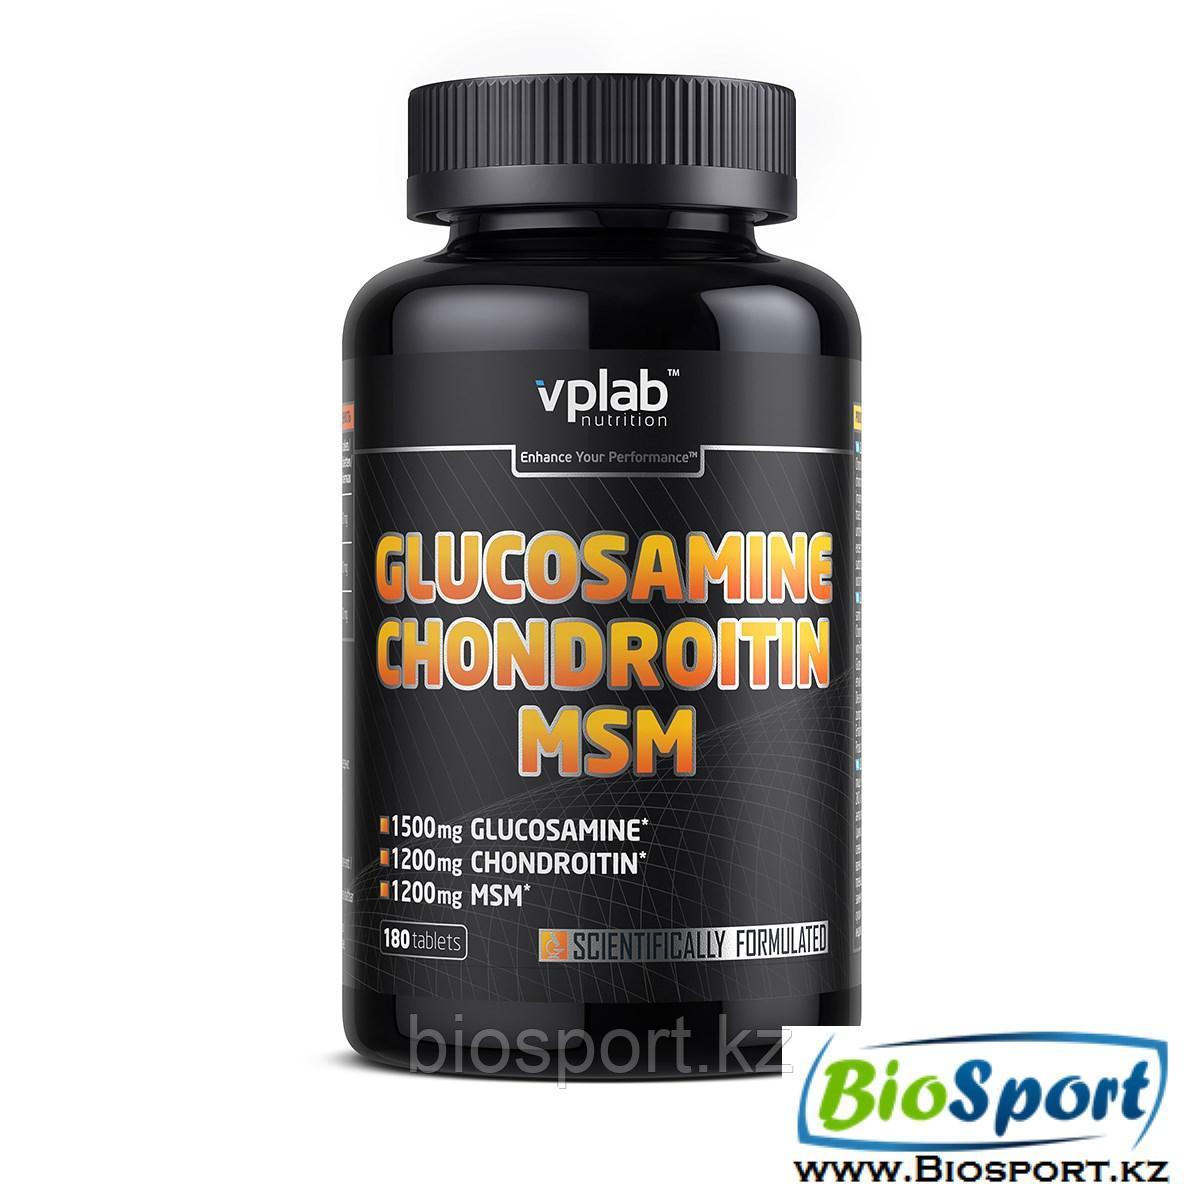 Glucosamine Chondroitin MSM 180 tab, VPLab.